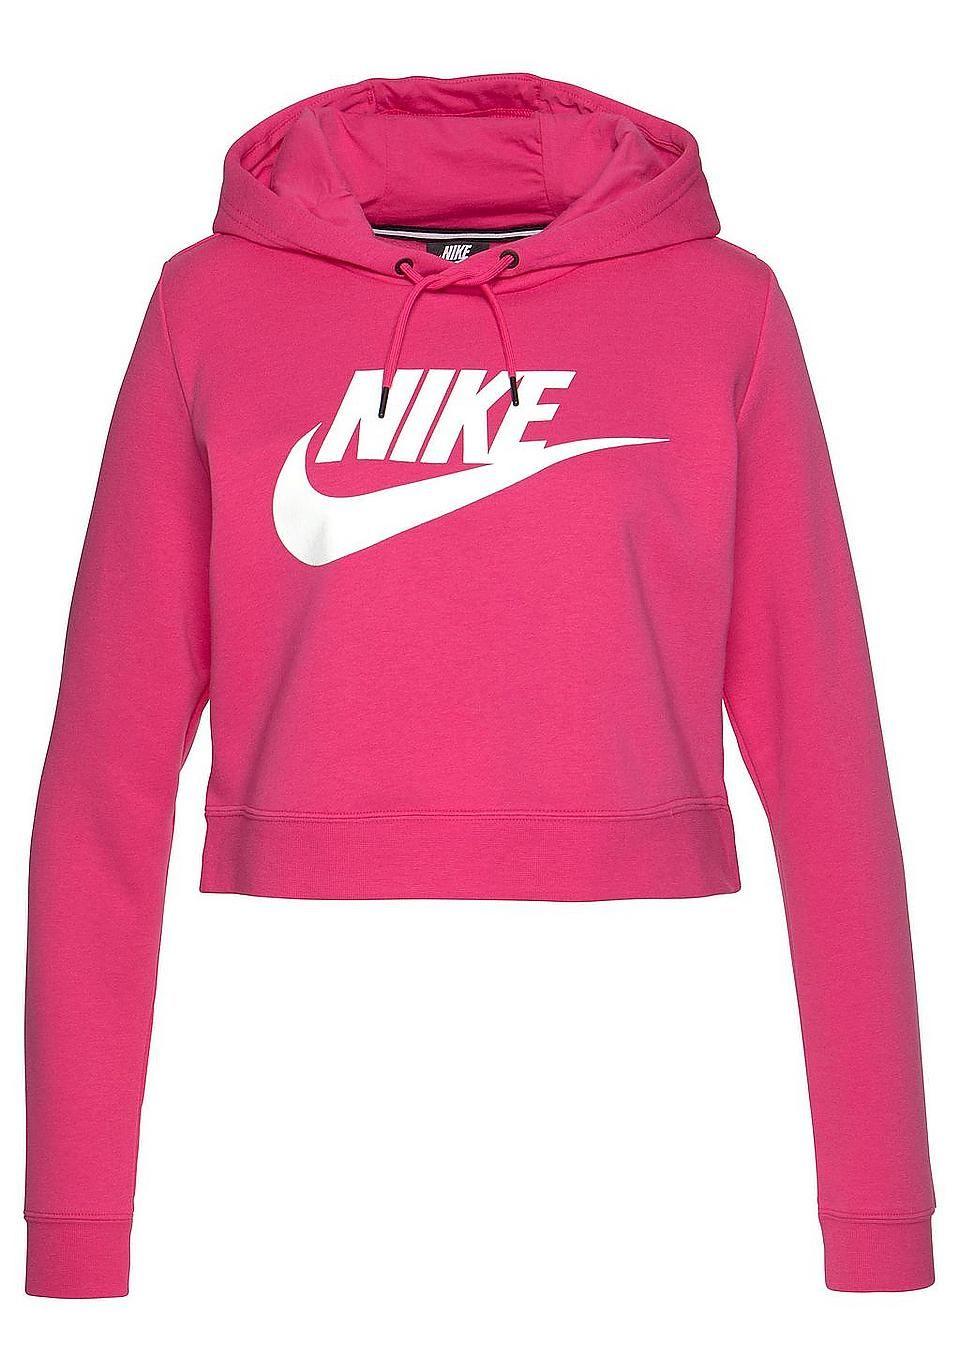 competitive price 70742 305d6 Nike Sportswear Kapuzensweatshirt »W NSW RALLY HOODIE CROP ...